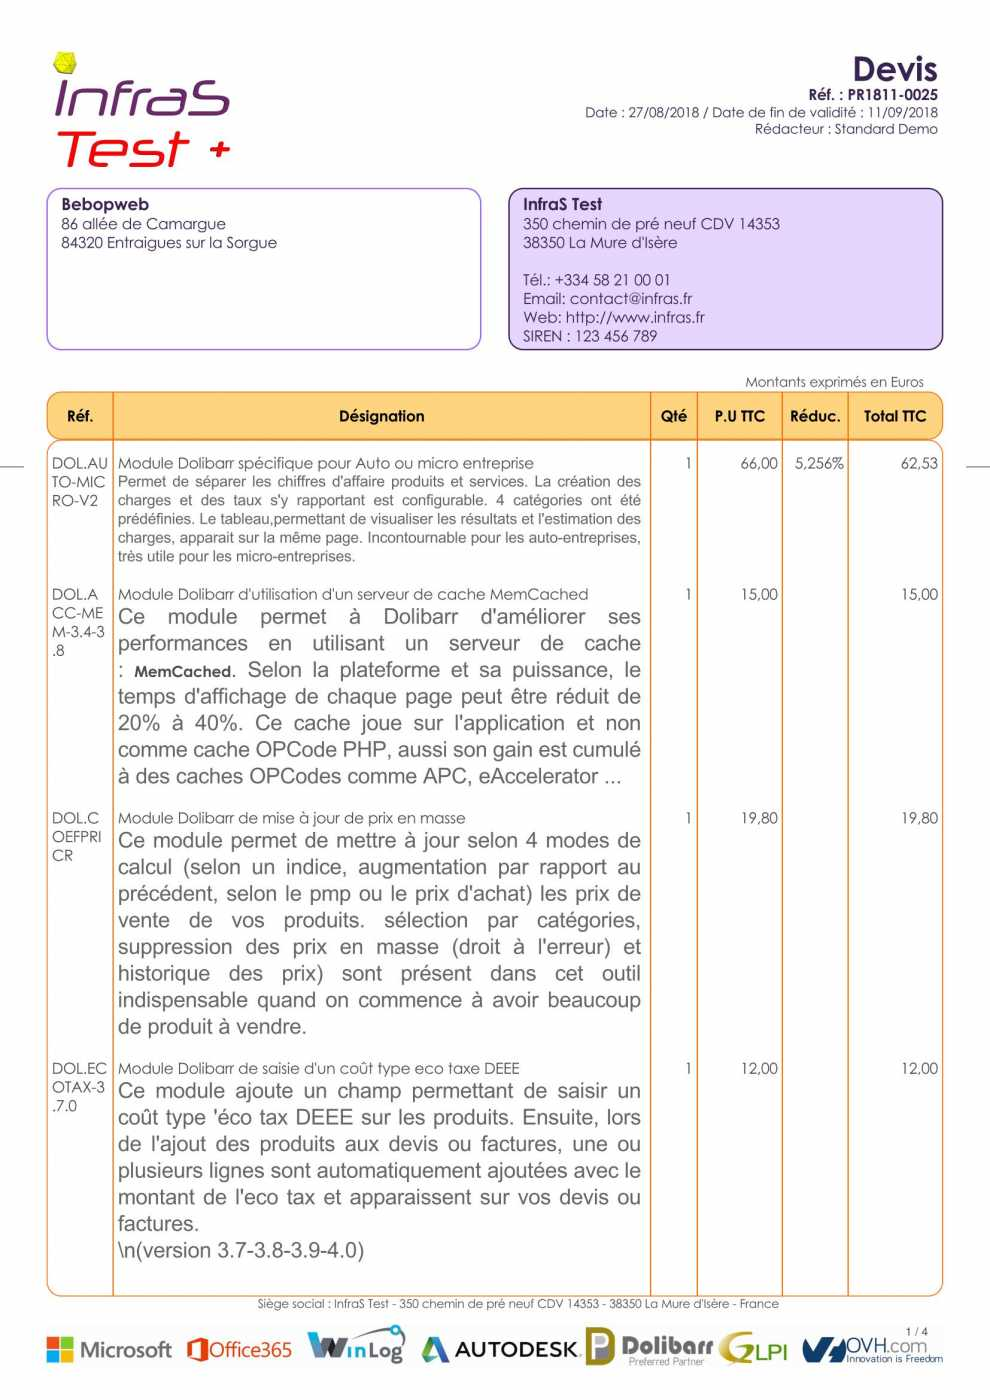 PR1811-0025_Page_1.jpeg